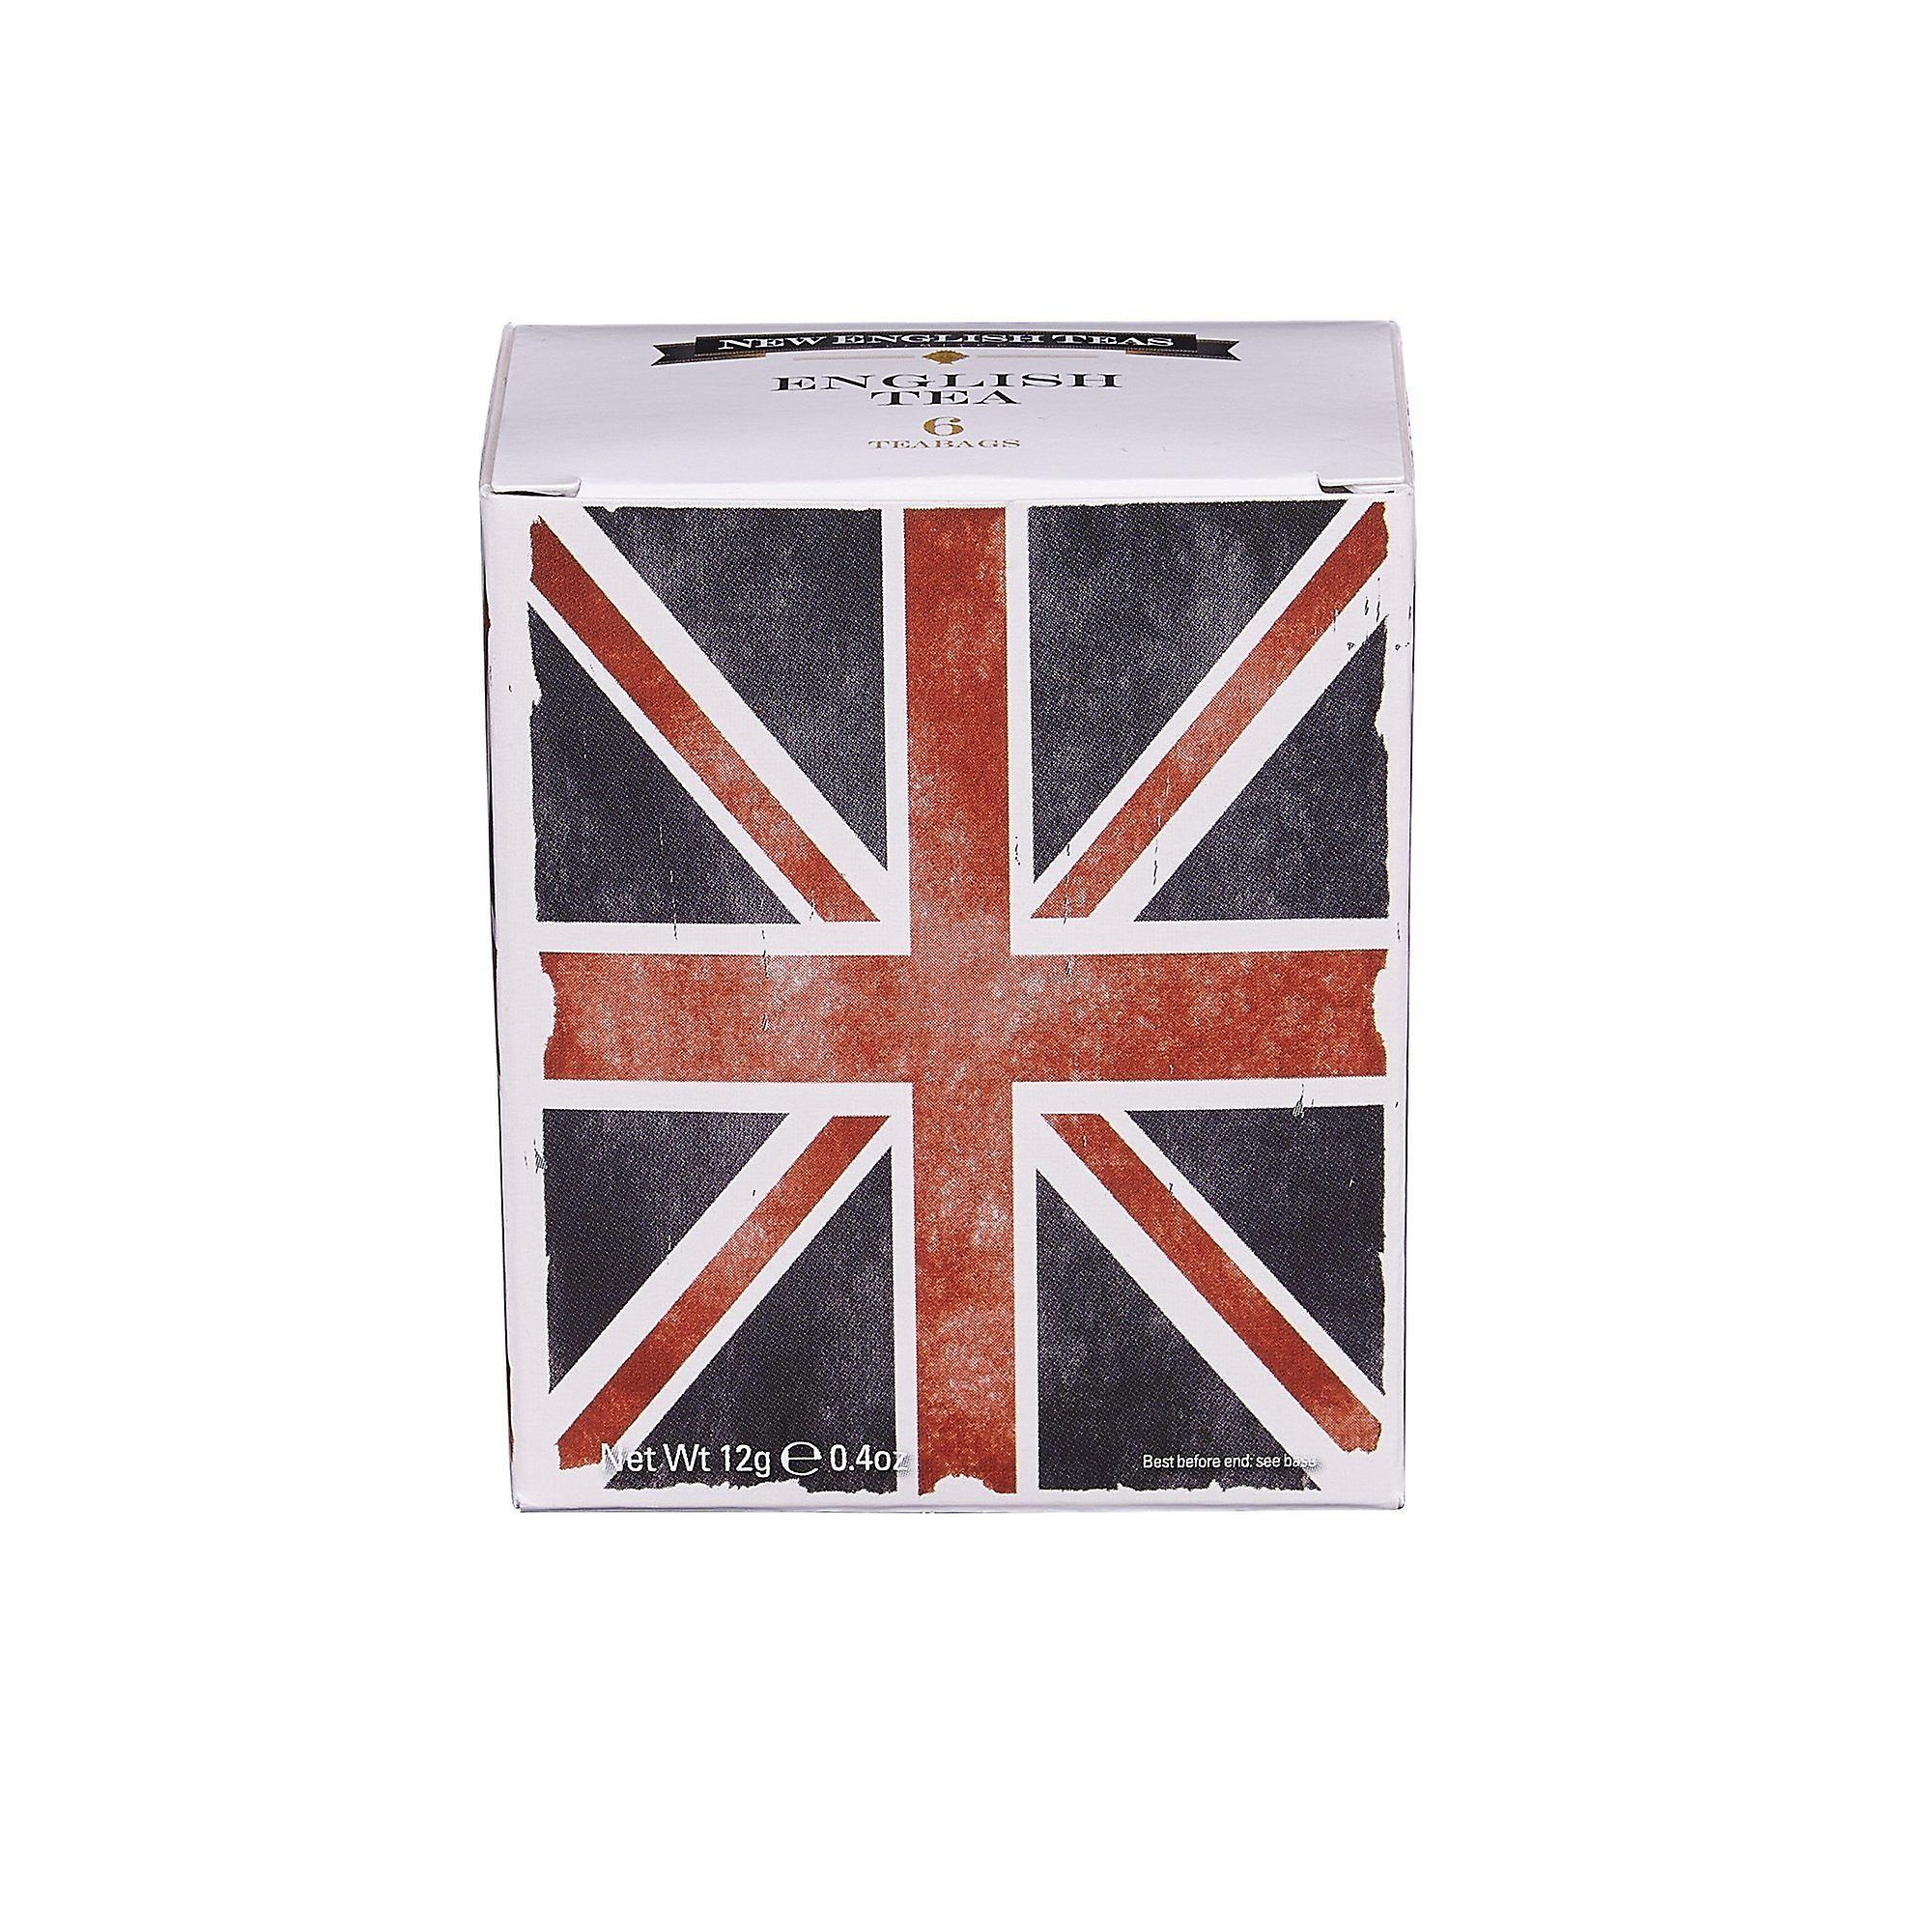 Black and white union jack english tea 6 teabag carton